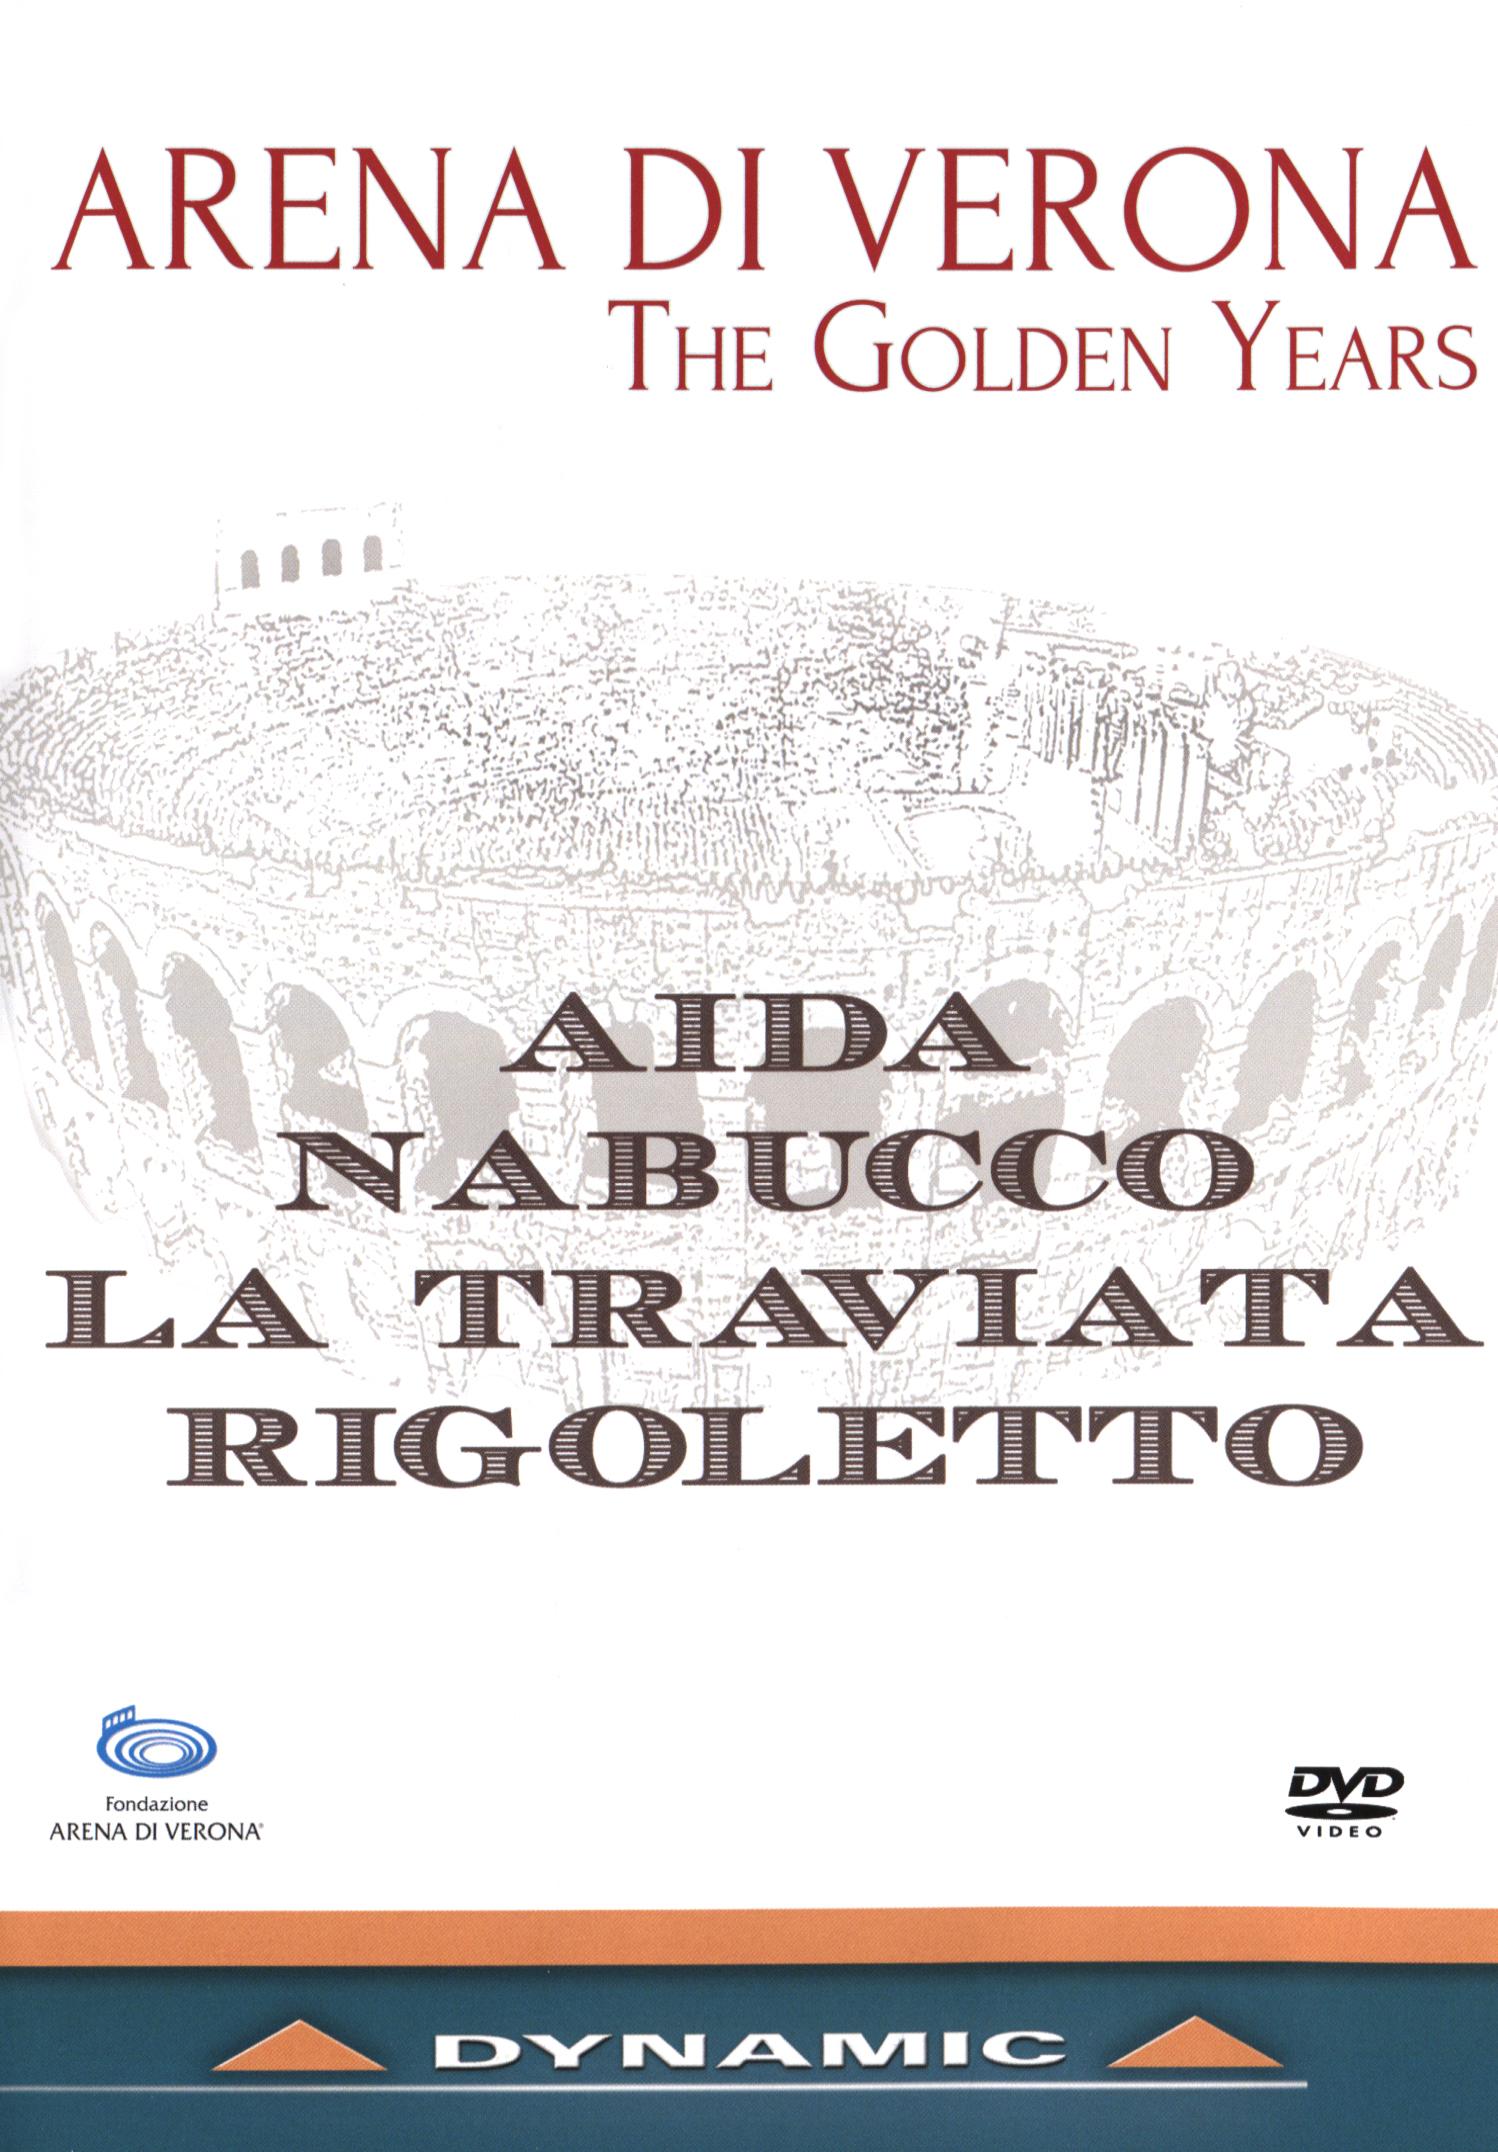 Arena di Verona: The Golden Years